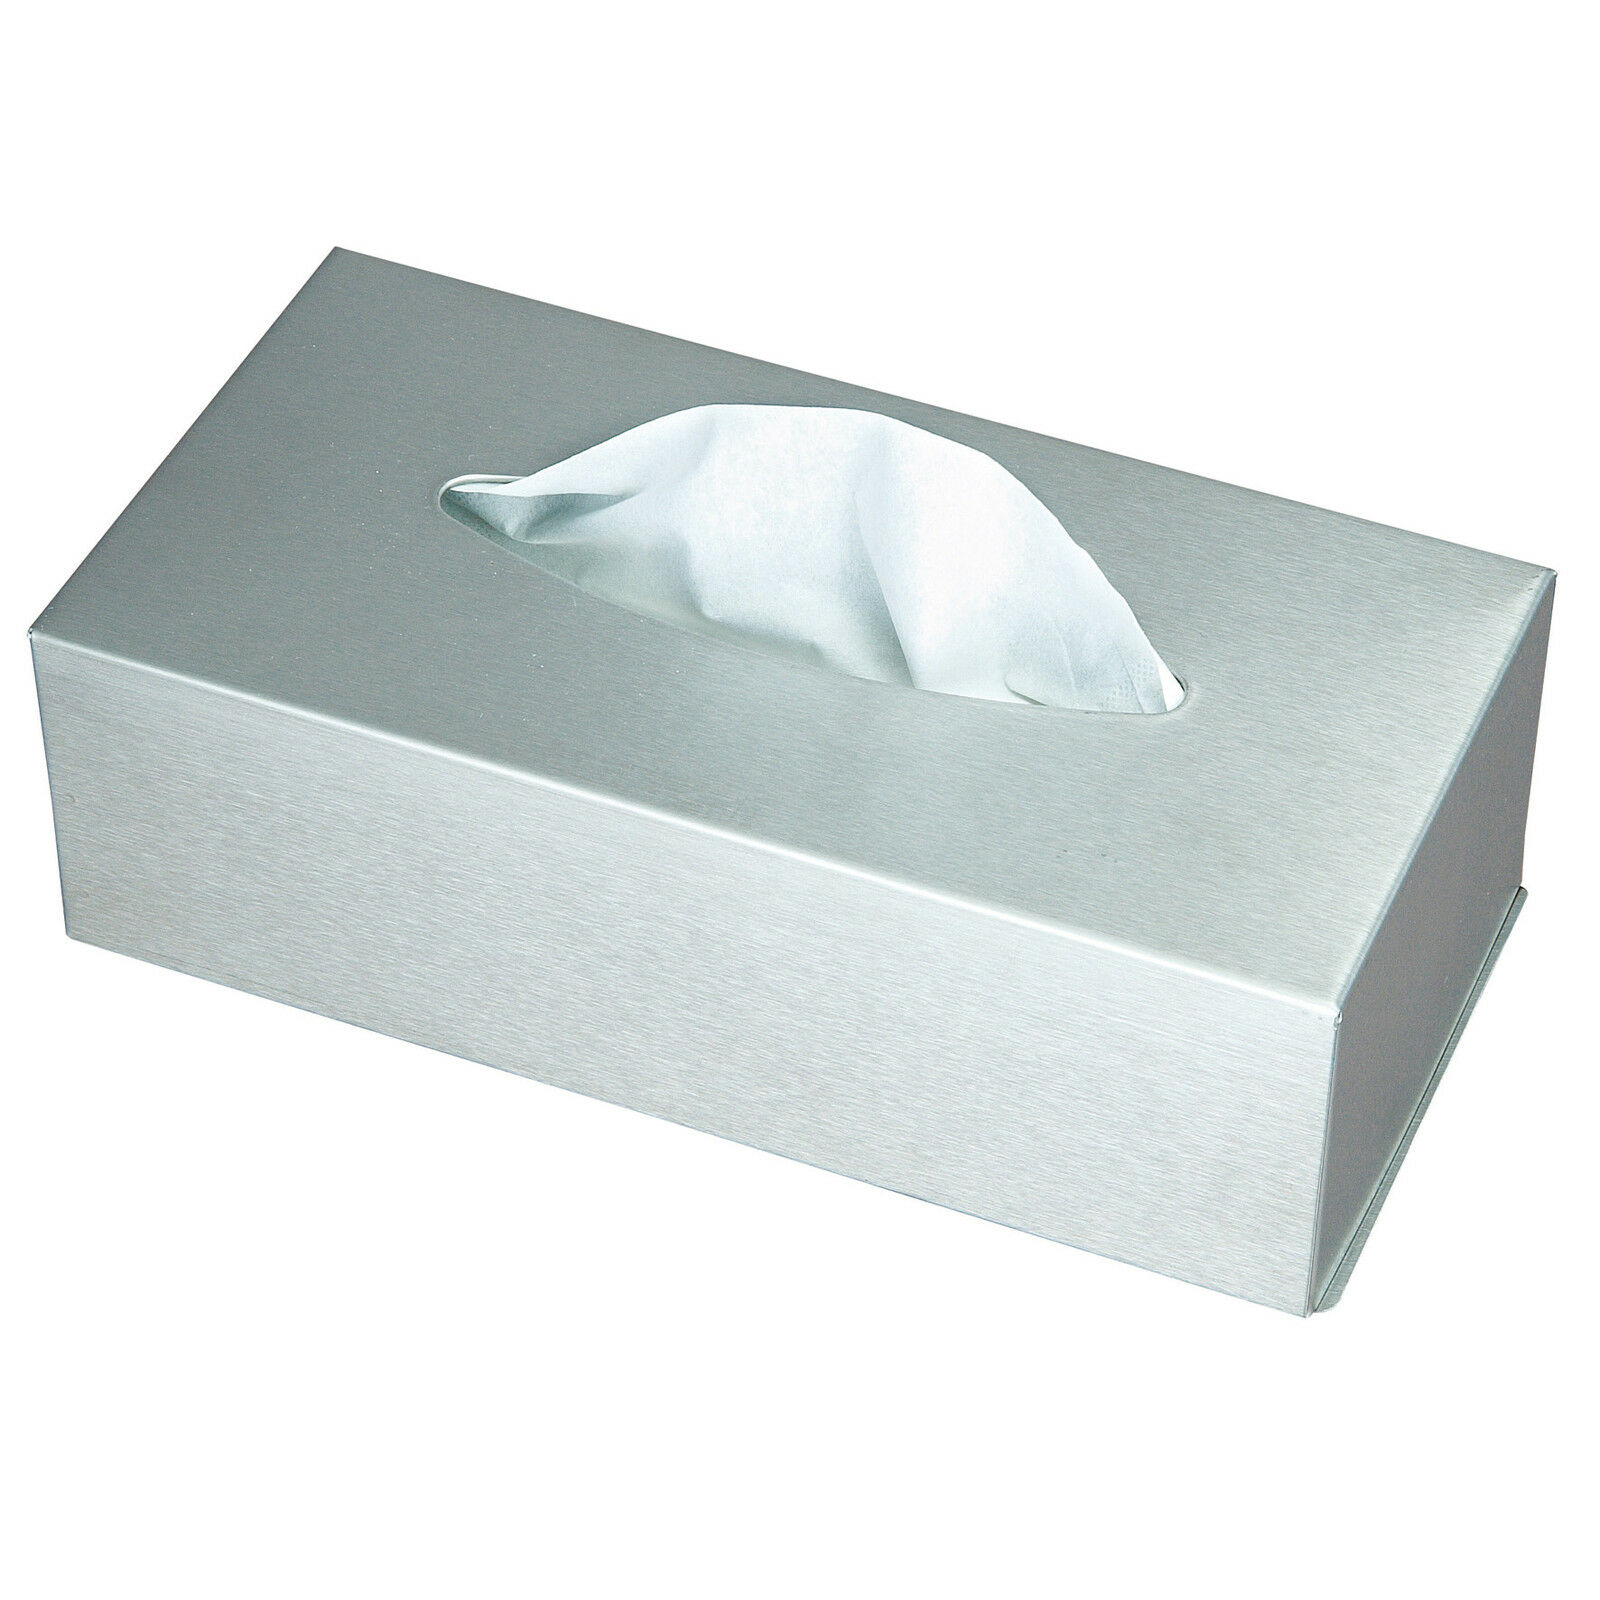 Kosmetikbox Kosmetiktuch Taschentuchbox Kosmetik Tücherbox Box Edelstahl matt